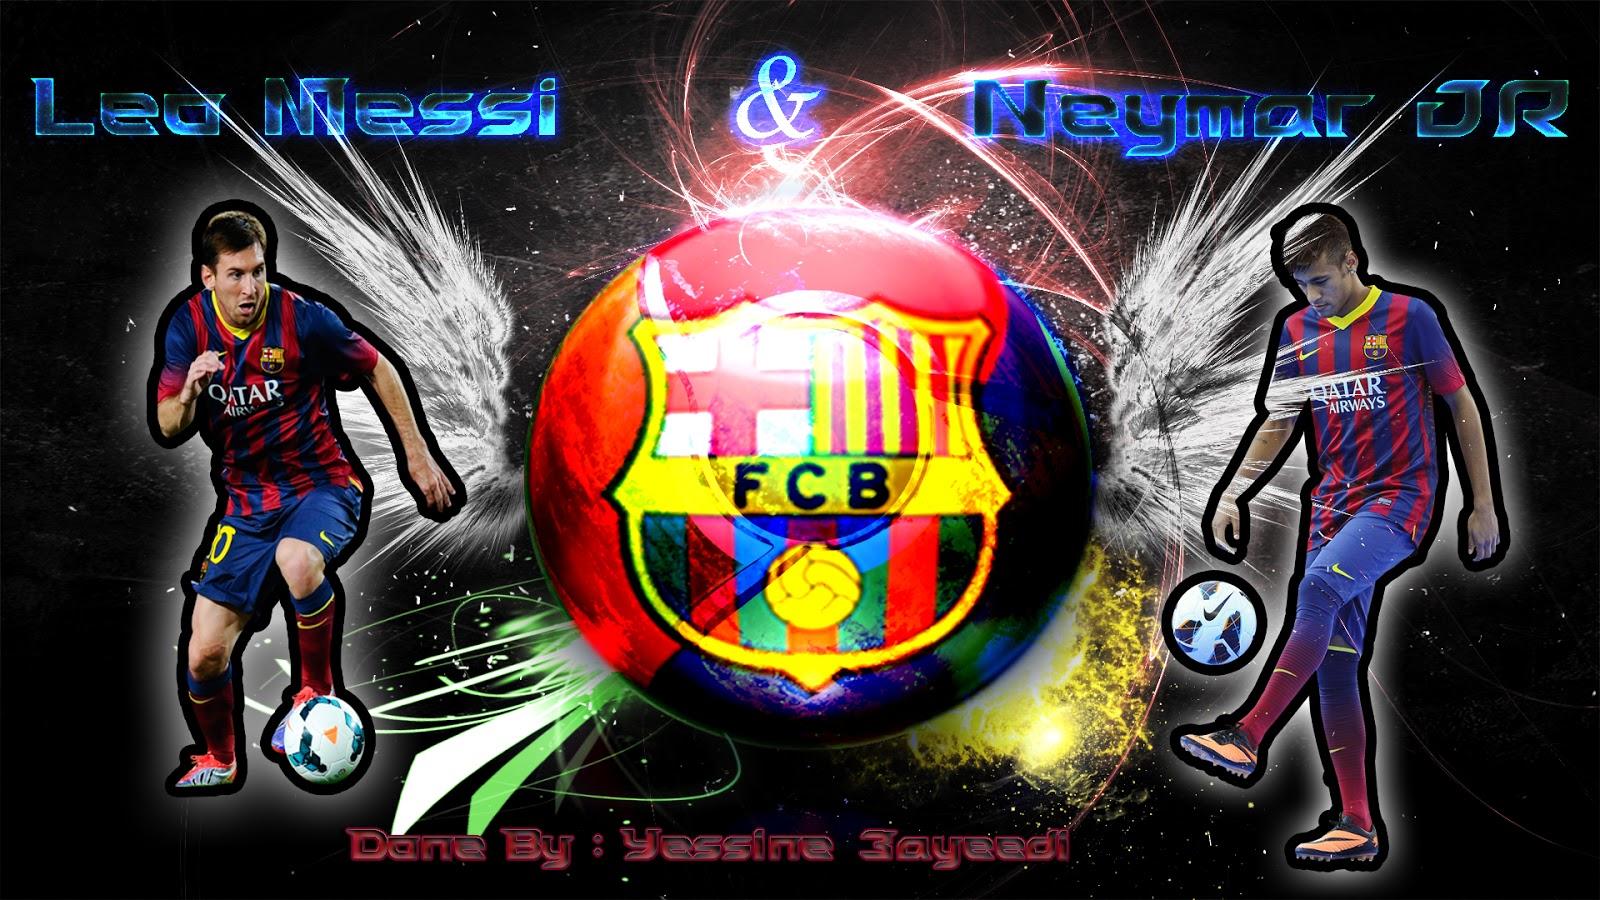 Messi And Neymar Wallpaper Neymar jr and messi wallpaper 1600x900